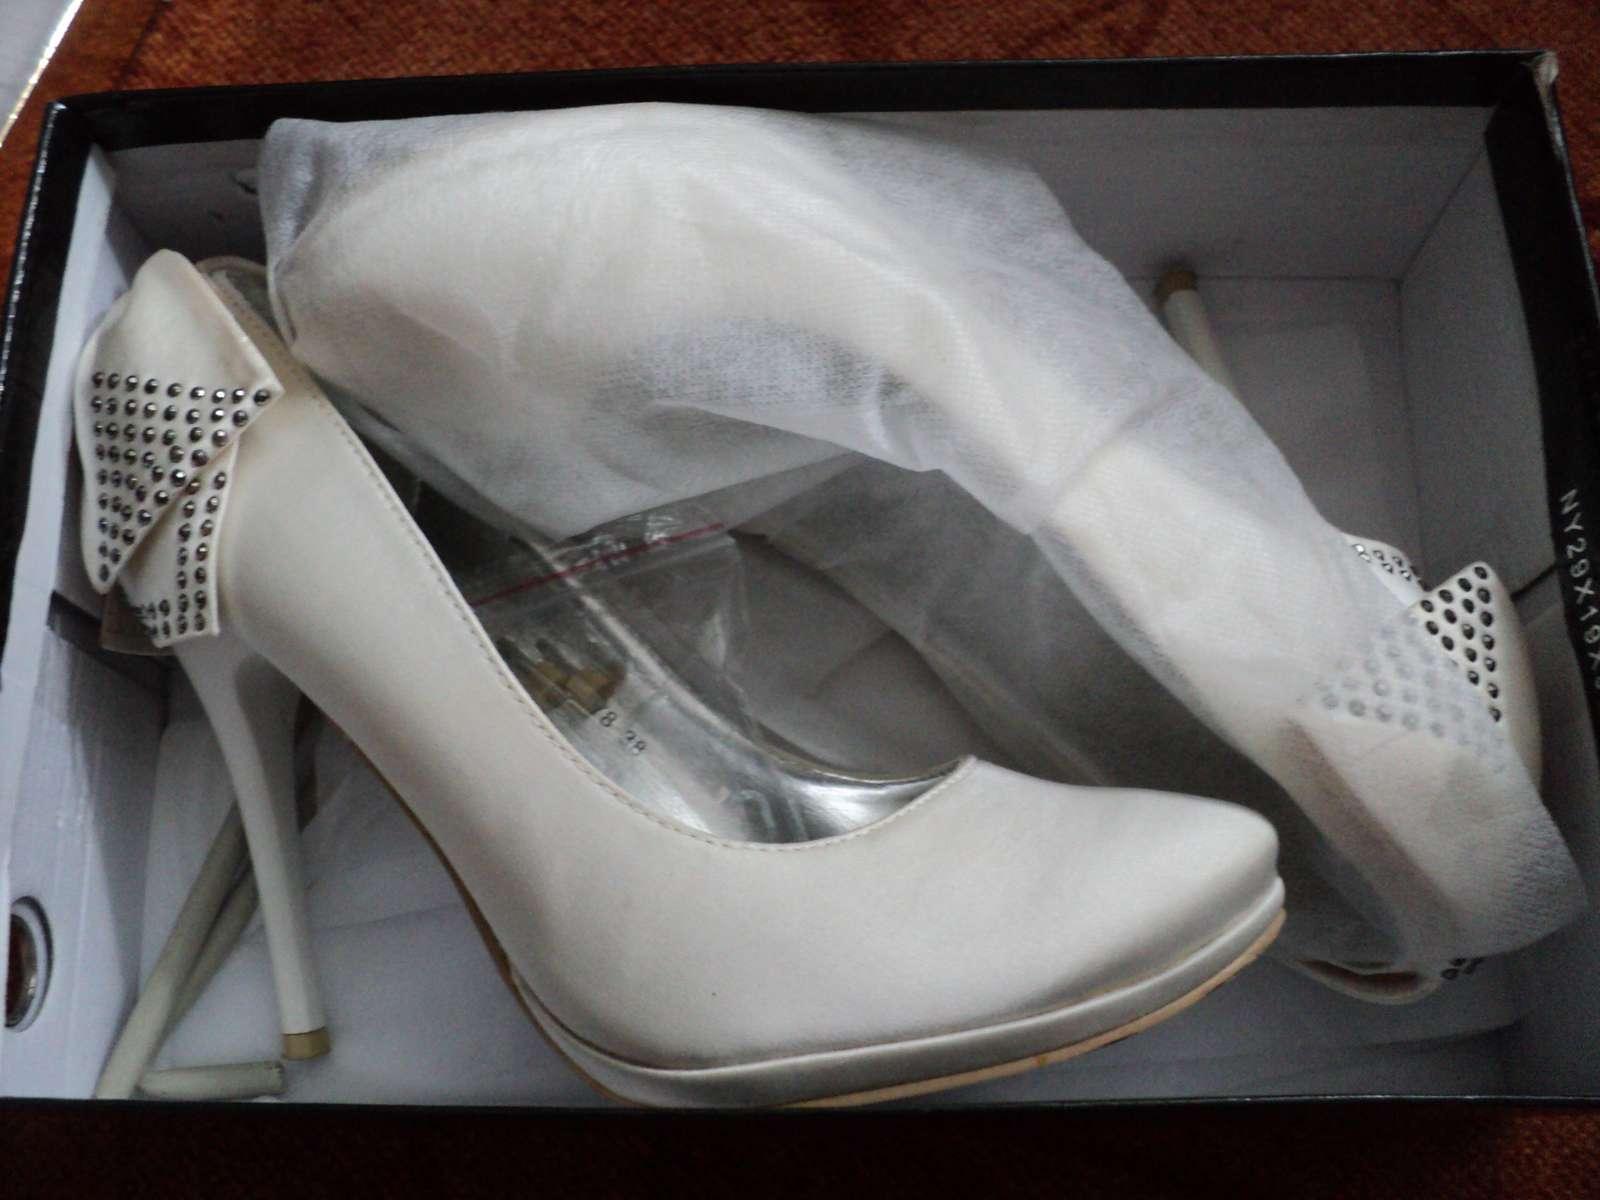 Biele topánky s mašličkou - Obrázok č. 4